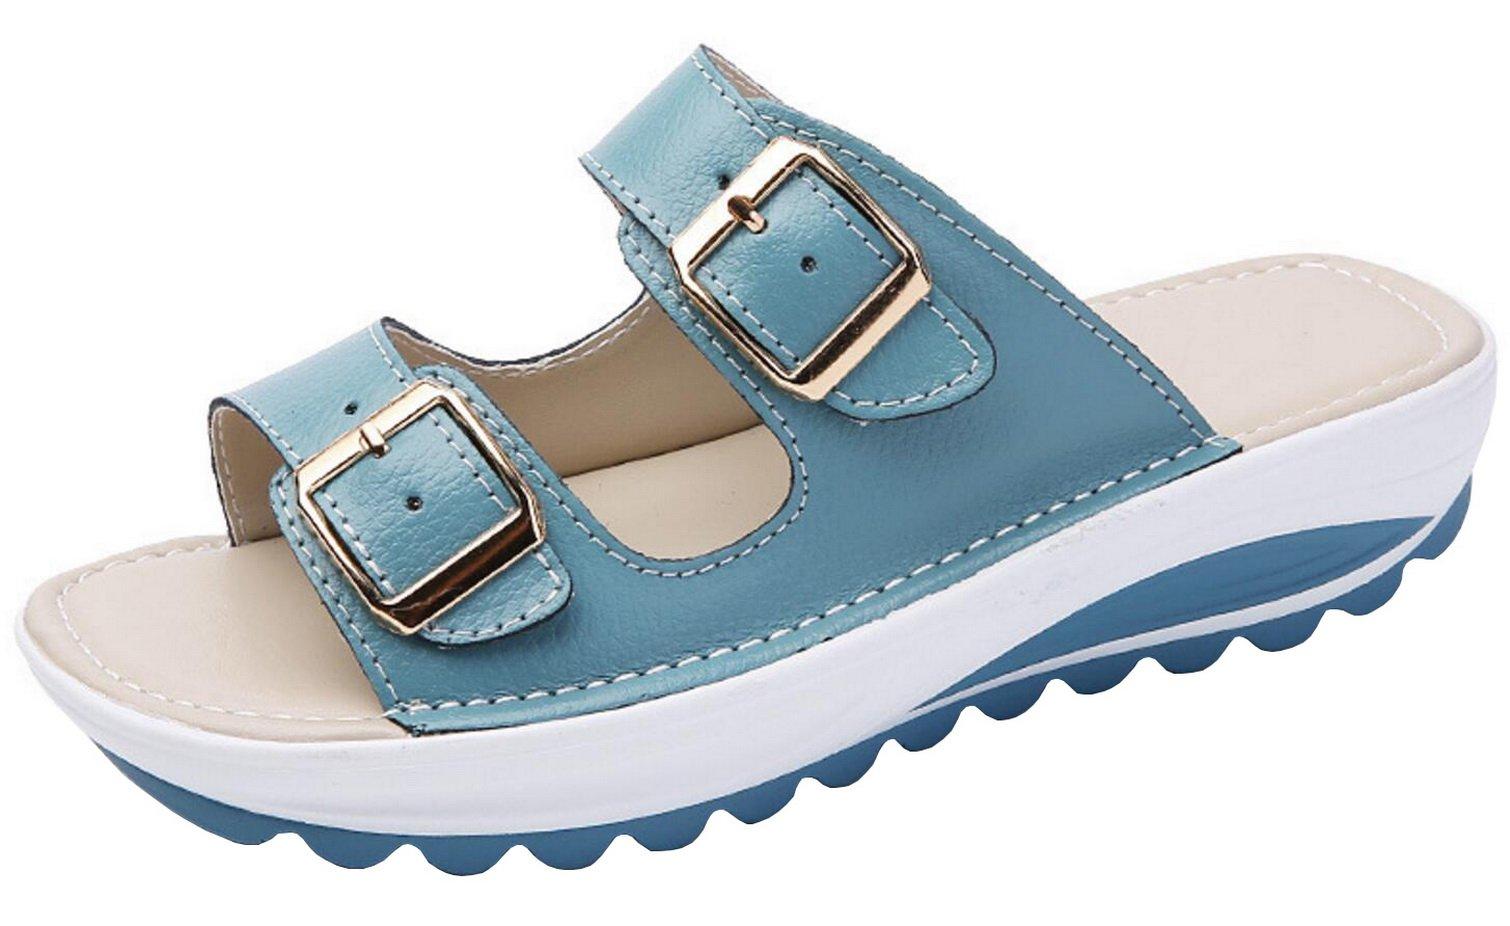 Vocni Women's Slide Leather Sandal Shoes Buckle T-Strap Platform Slide Sandals Blue EU 39-8B(M) US